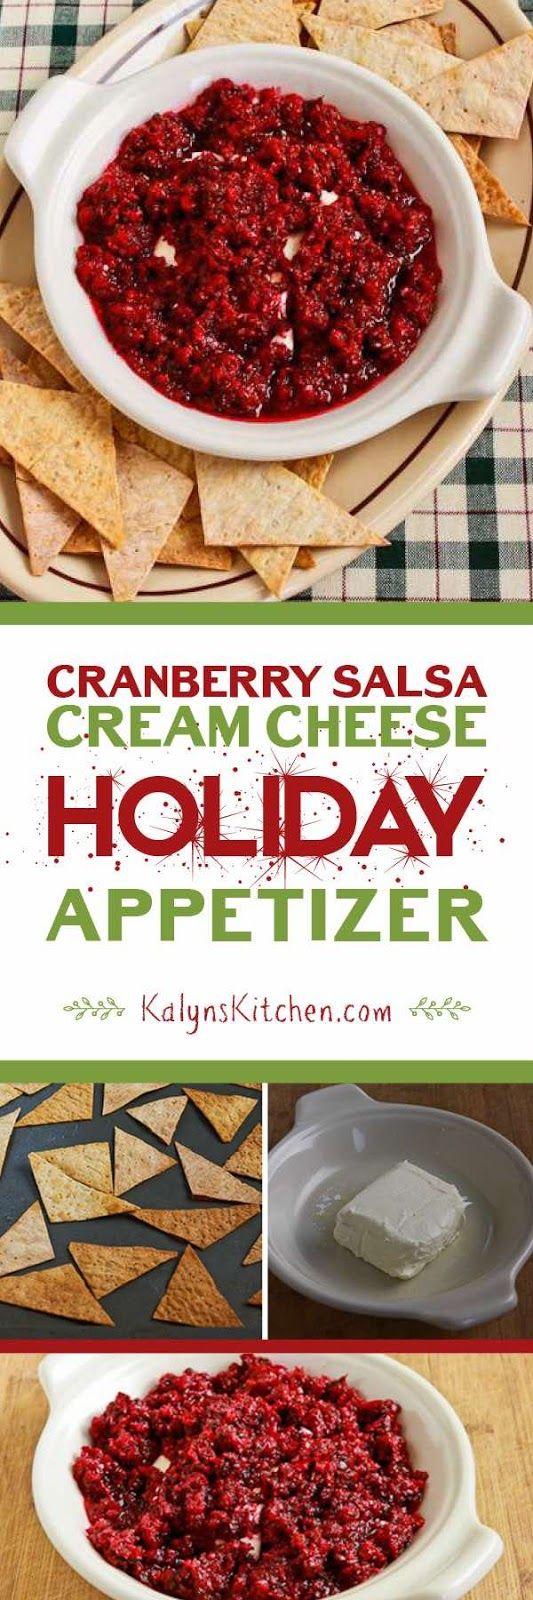 Cranberry Salsa Cream Cheese Holiday Appetizer | Cranberry salsa ...